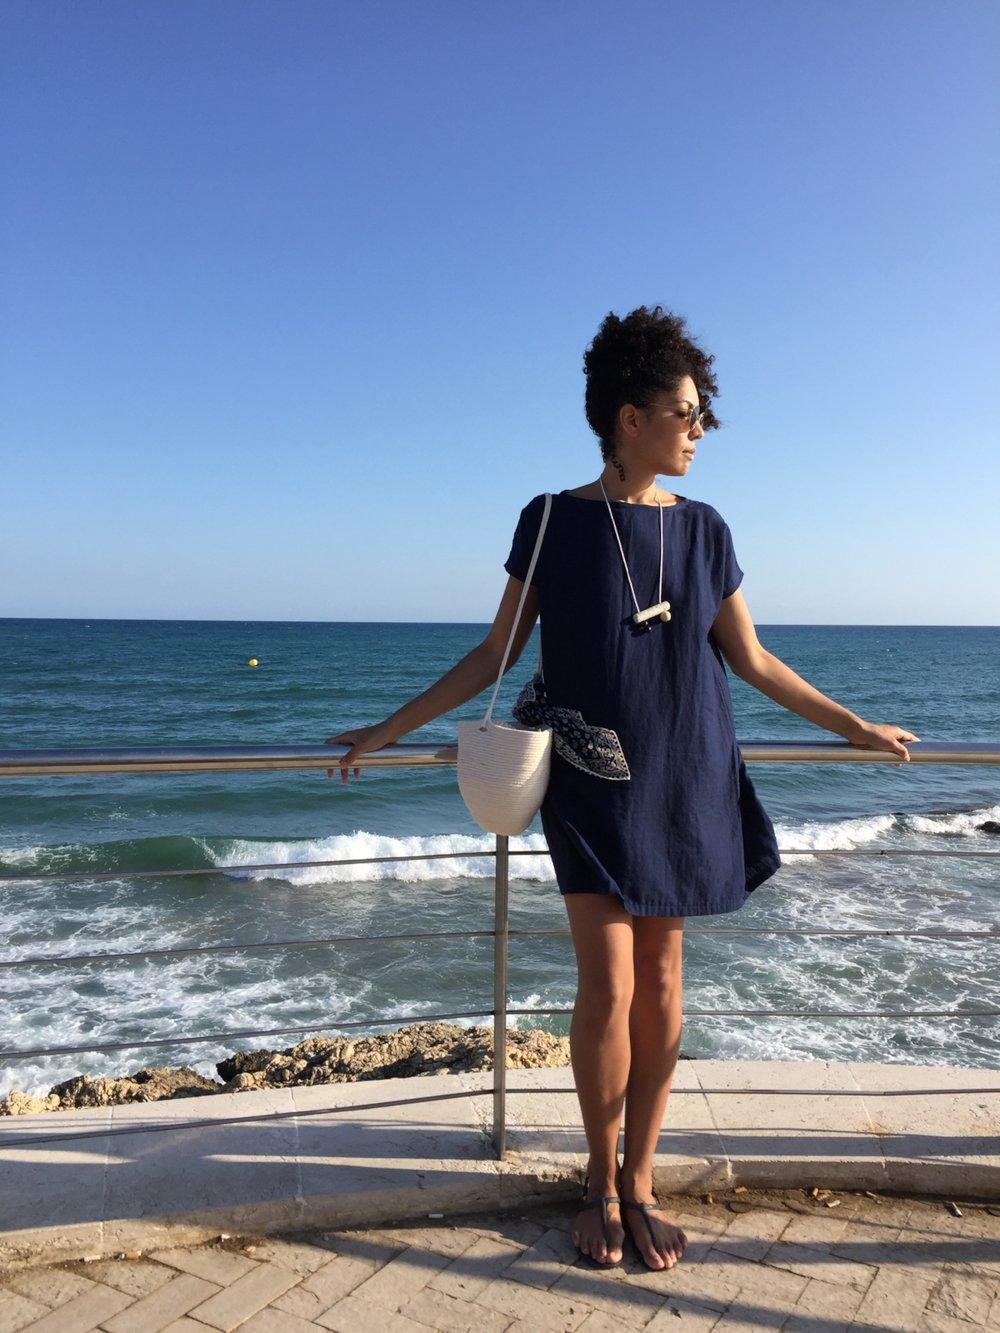 ee504-seesoomuch_minimalist_travel_wardrobe_packingseesoomuch_minimalist_travel_wardrobe_packing.jpg